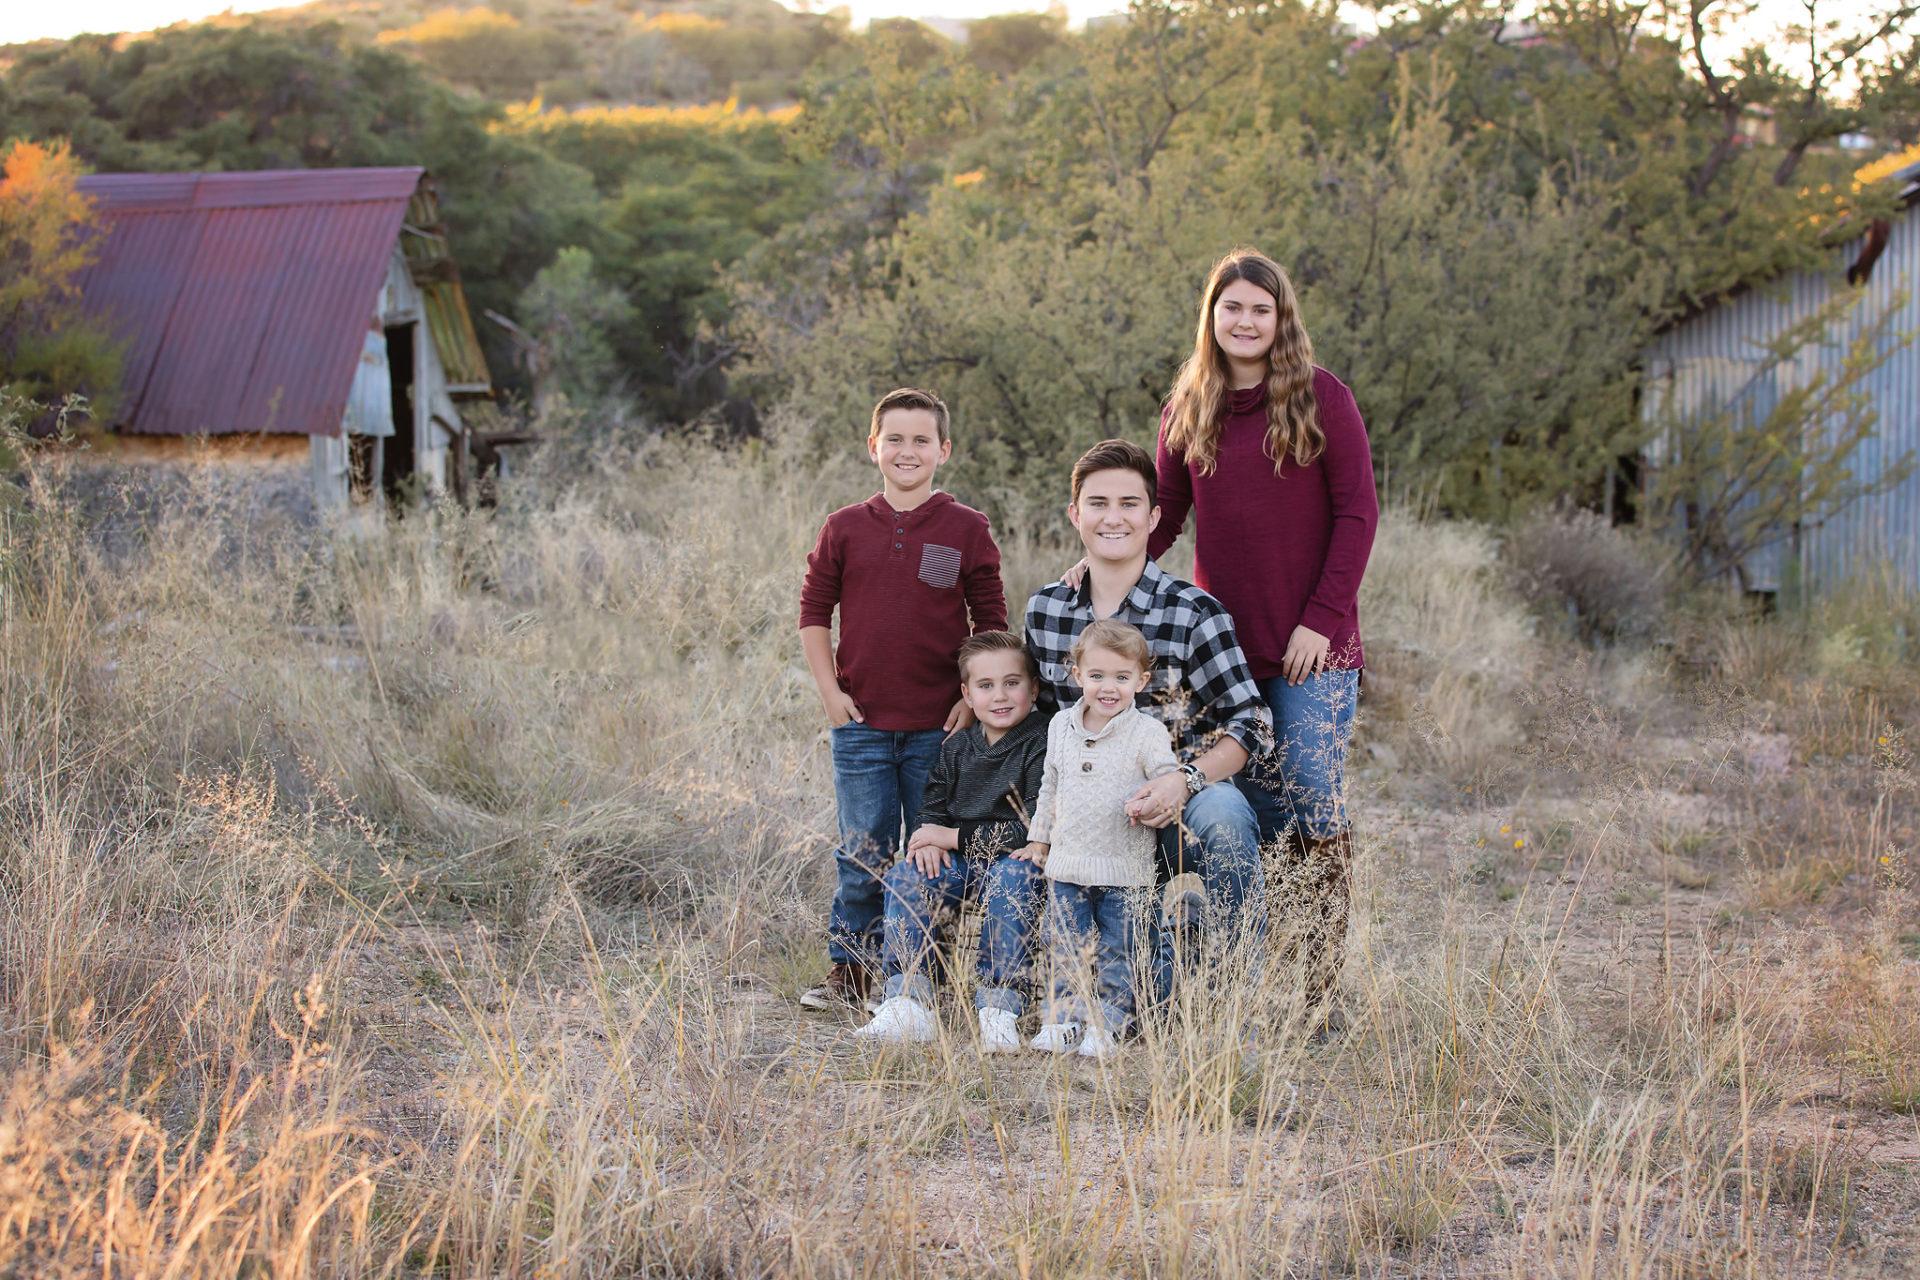 Children Photographer Tucson